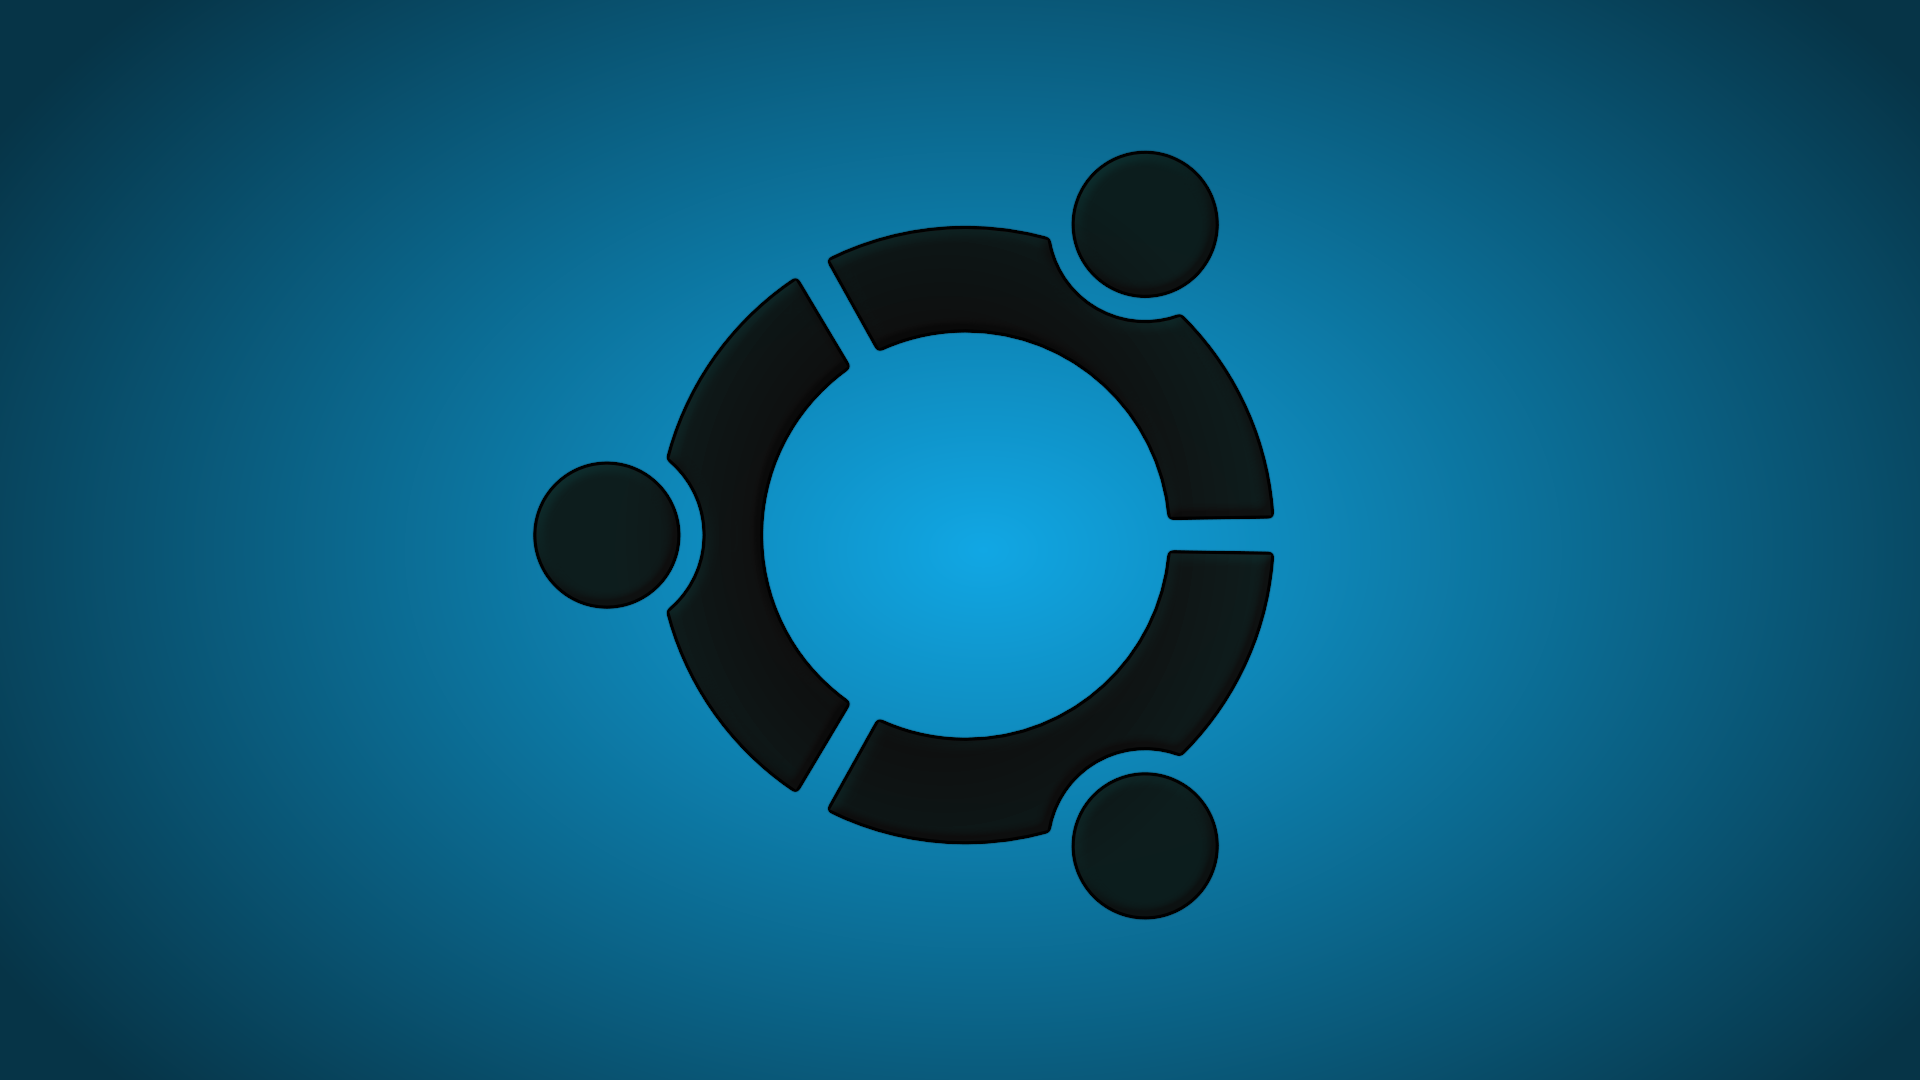 Ubuntu Wallpaper Blue 1920x1080